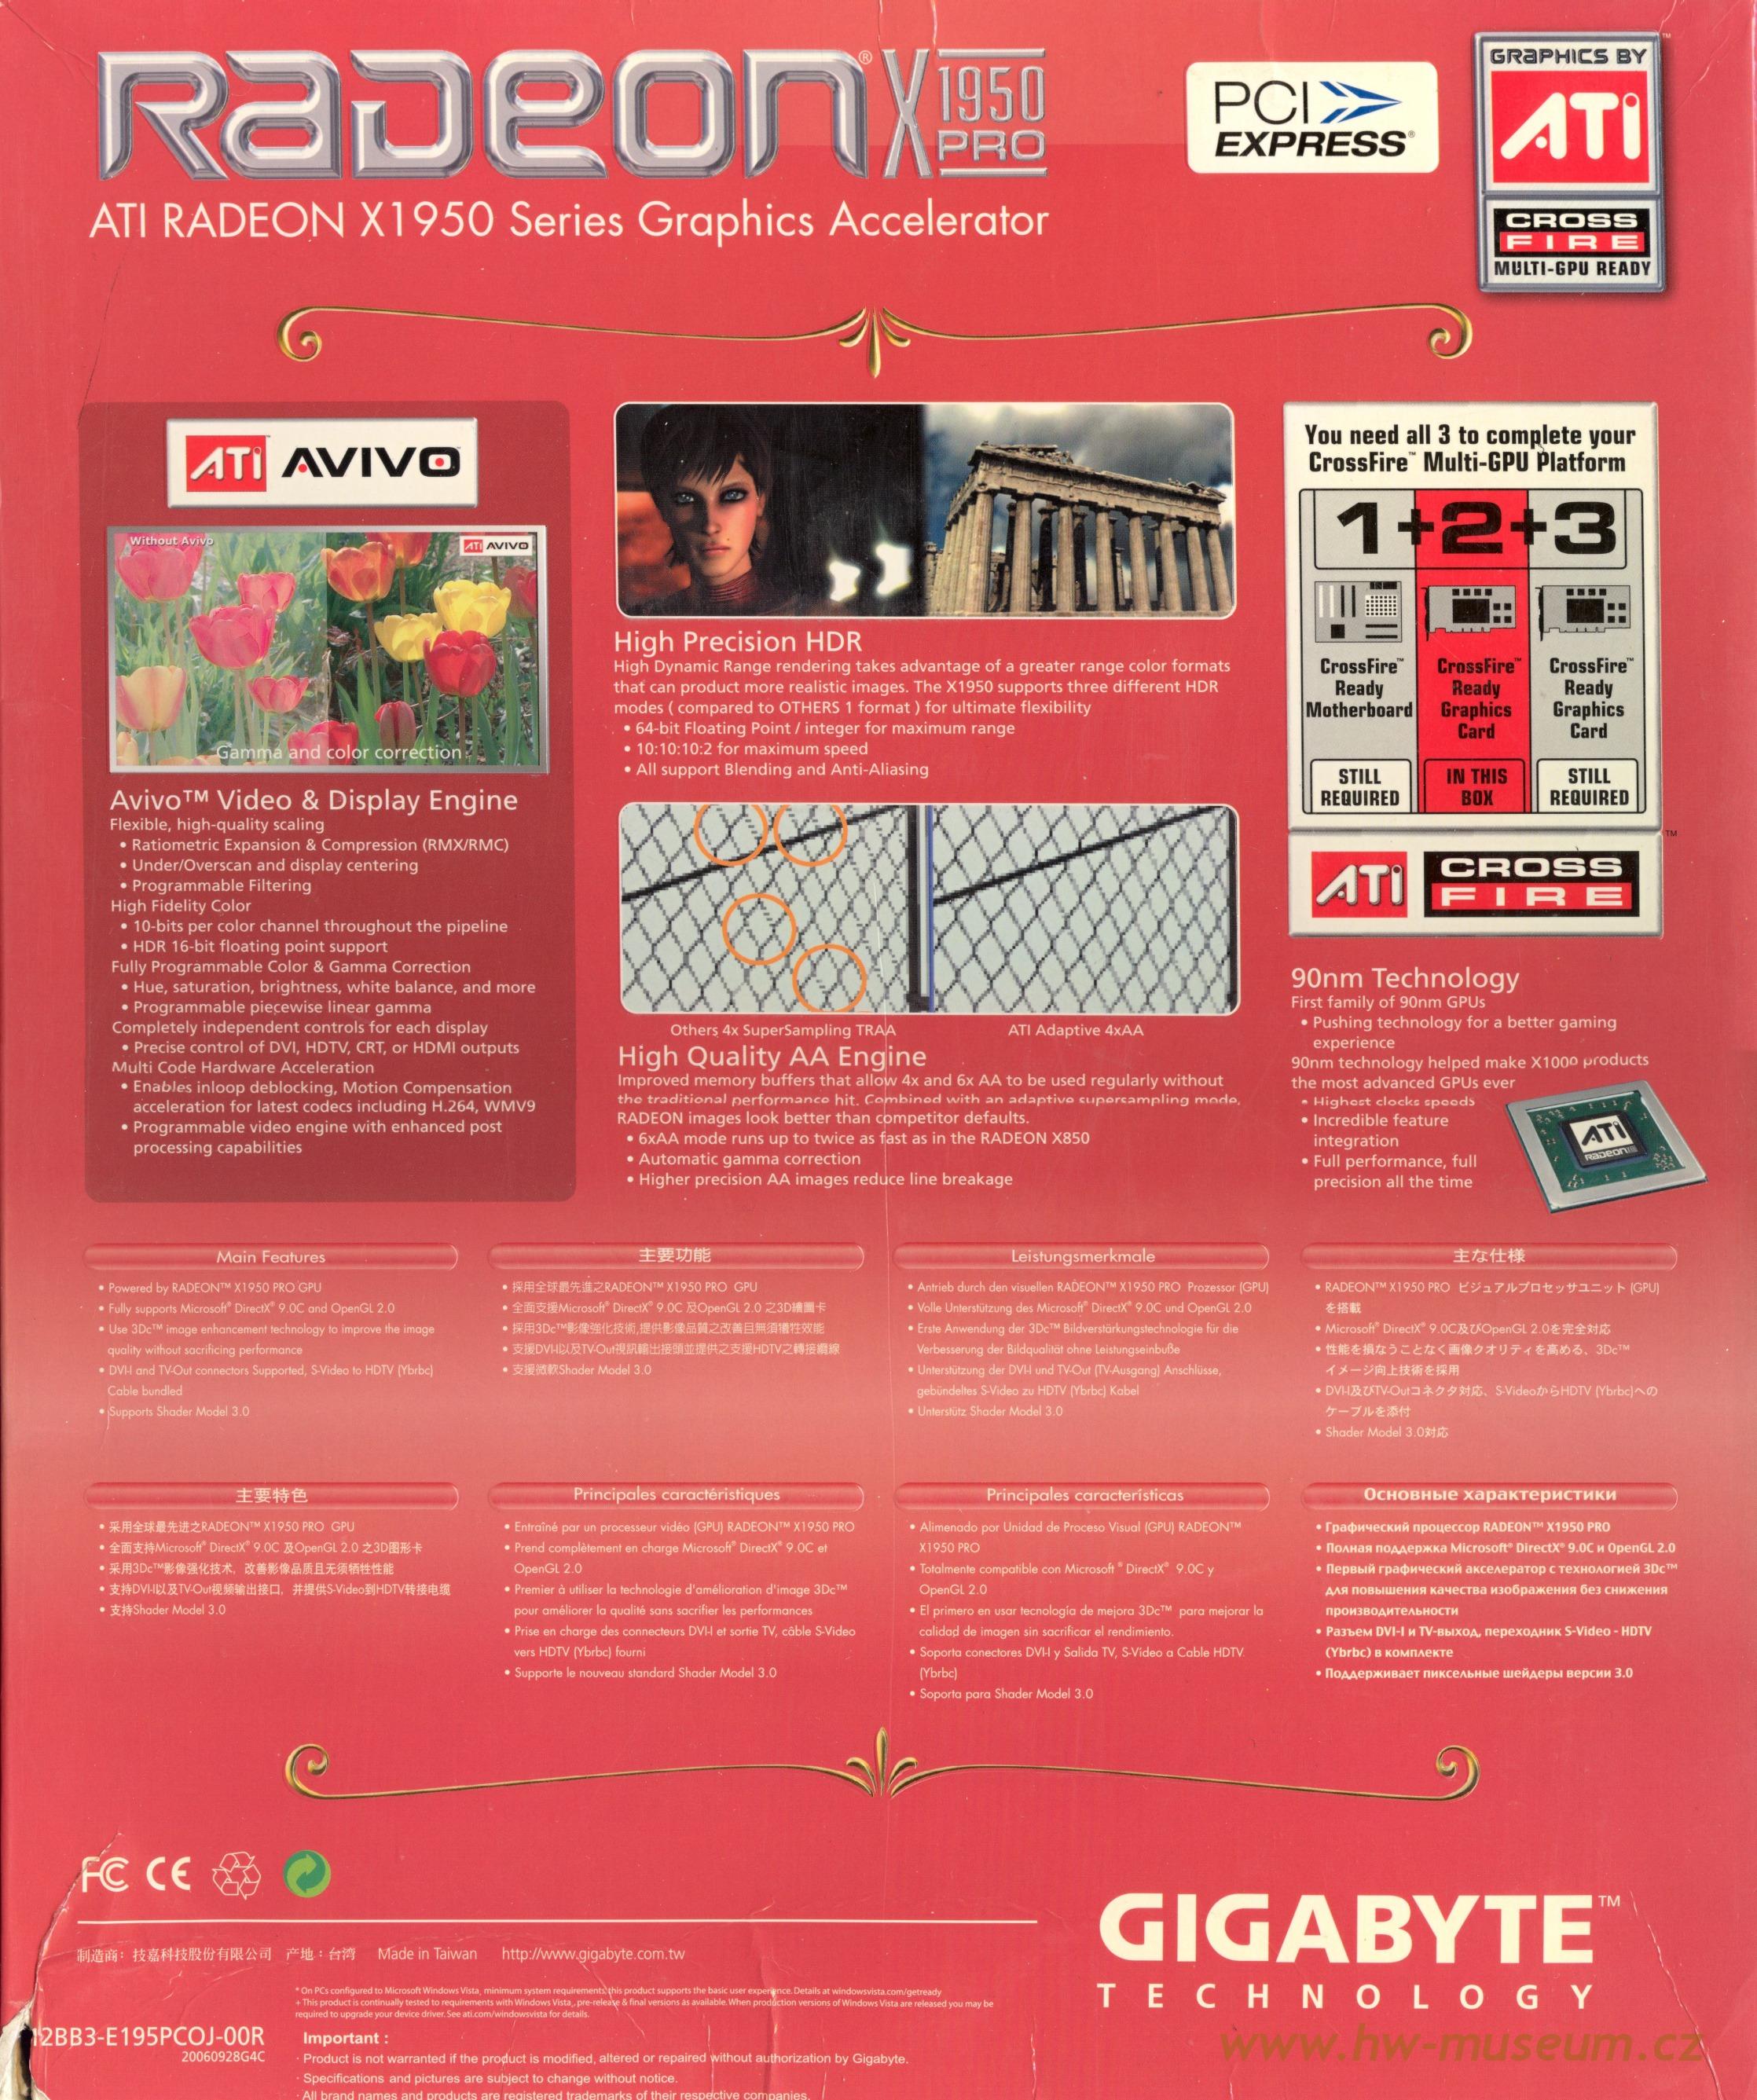 Gigabyte Radeon X1950 Pro - Hardware museum